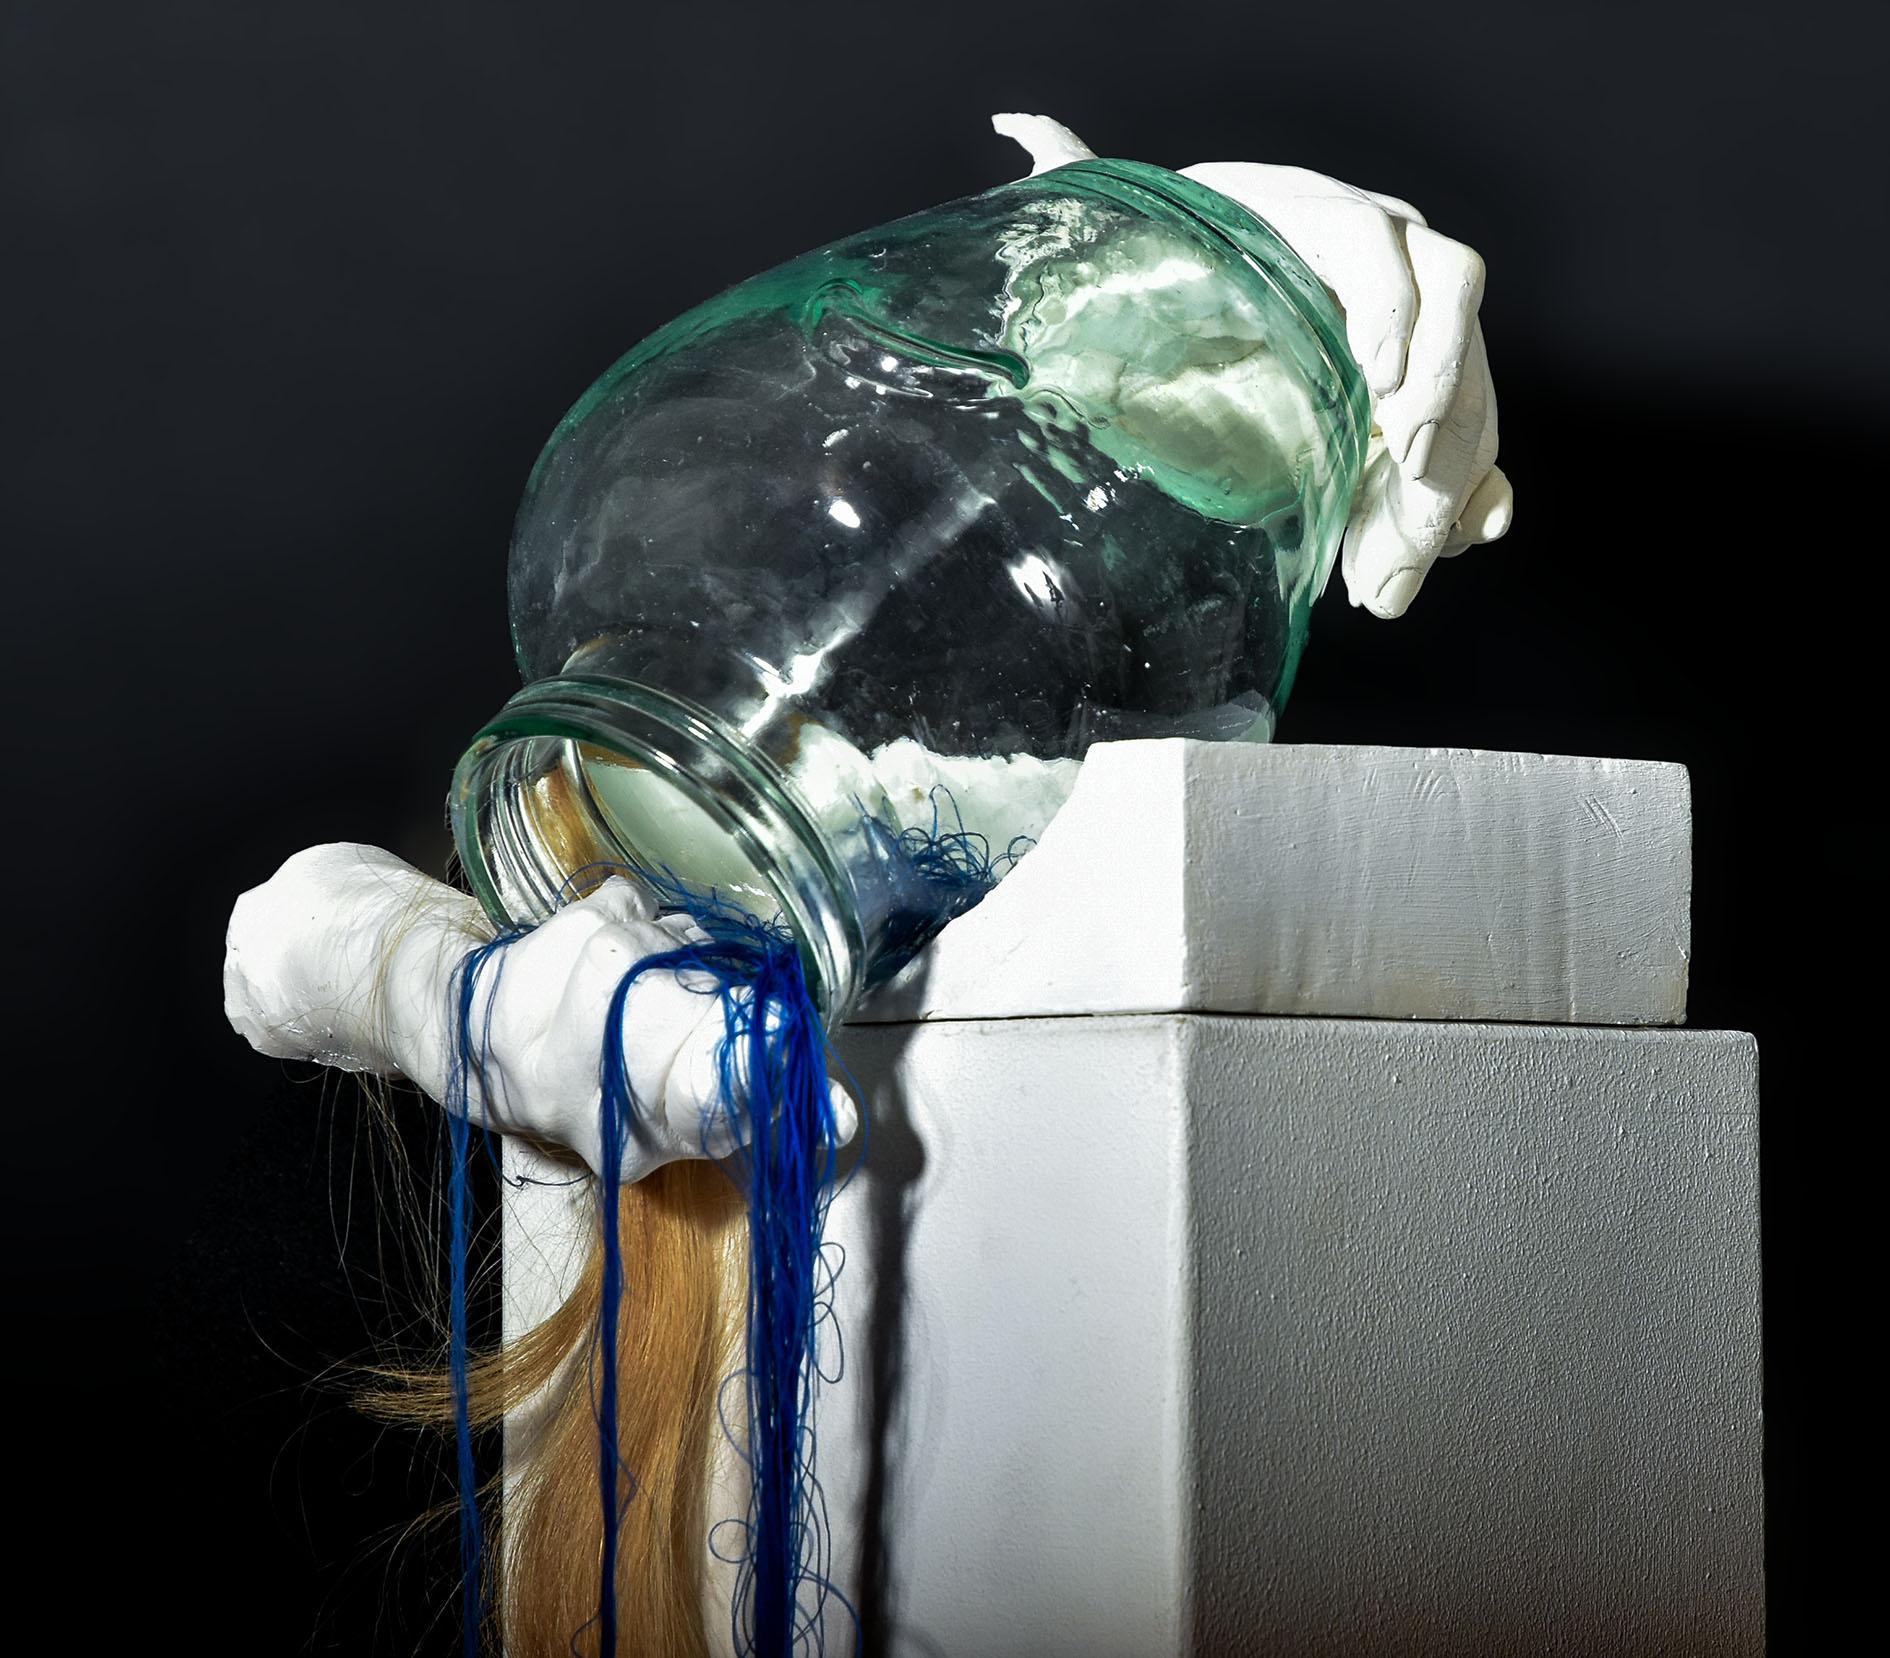 fontaine2017-21b